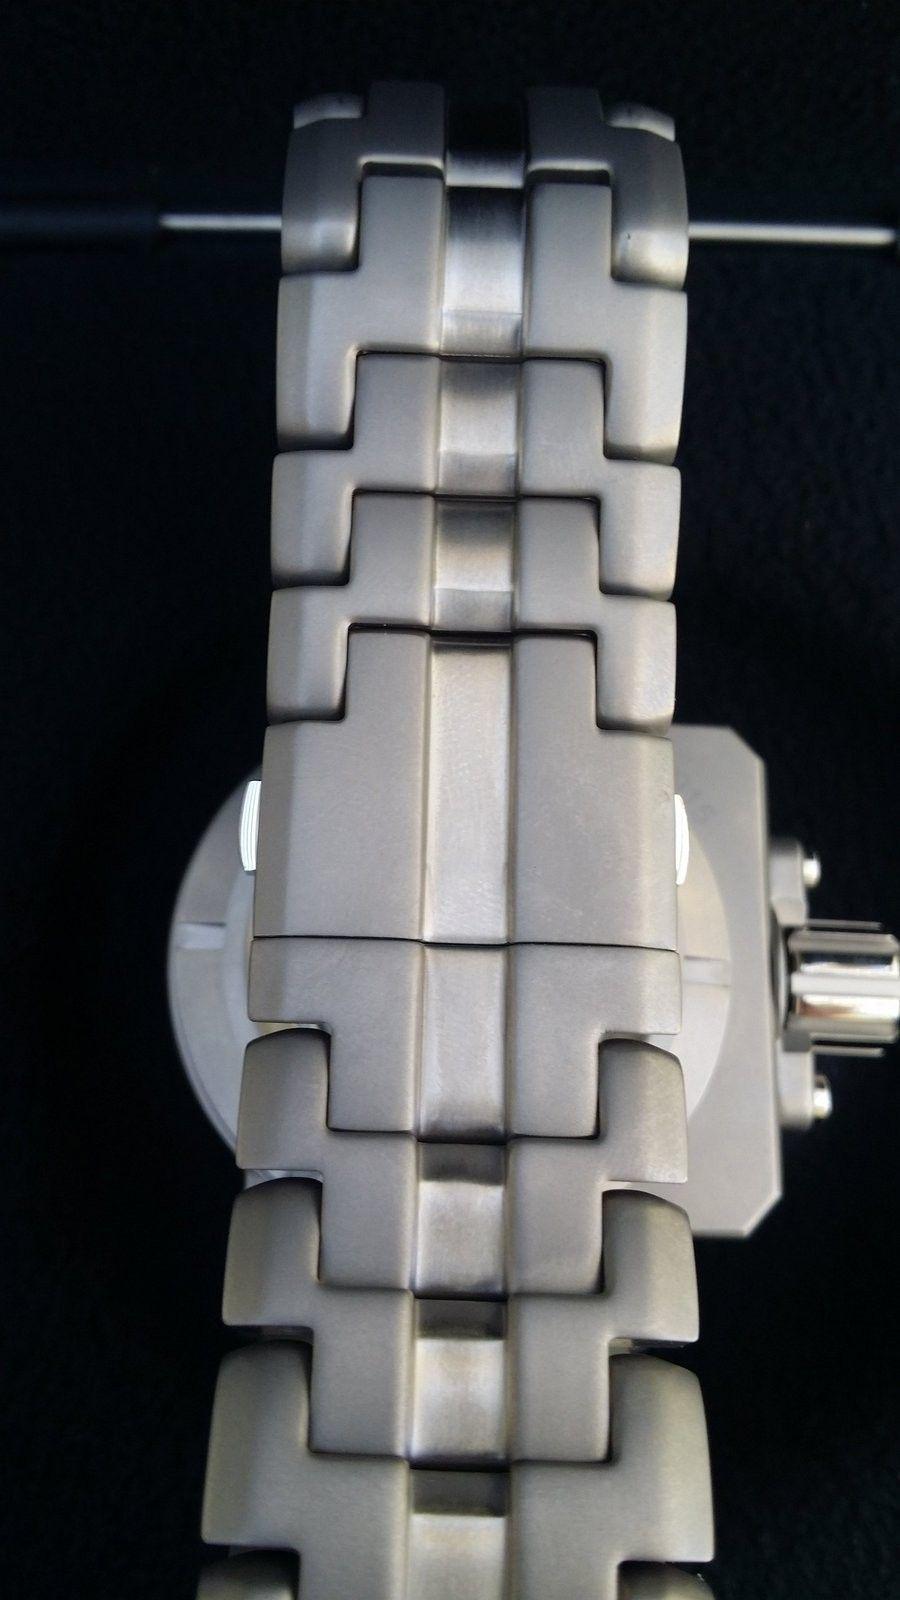 Gearbox Automatic Bracelet - 20150829_090511.jpg